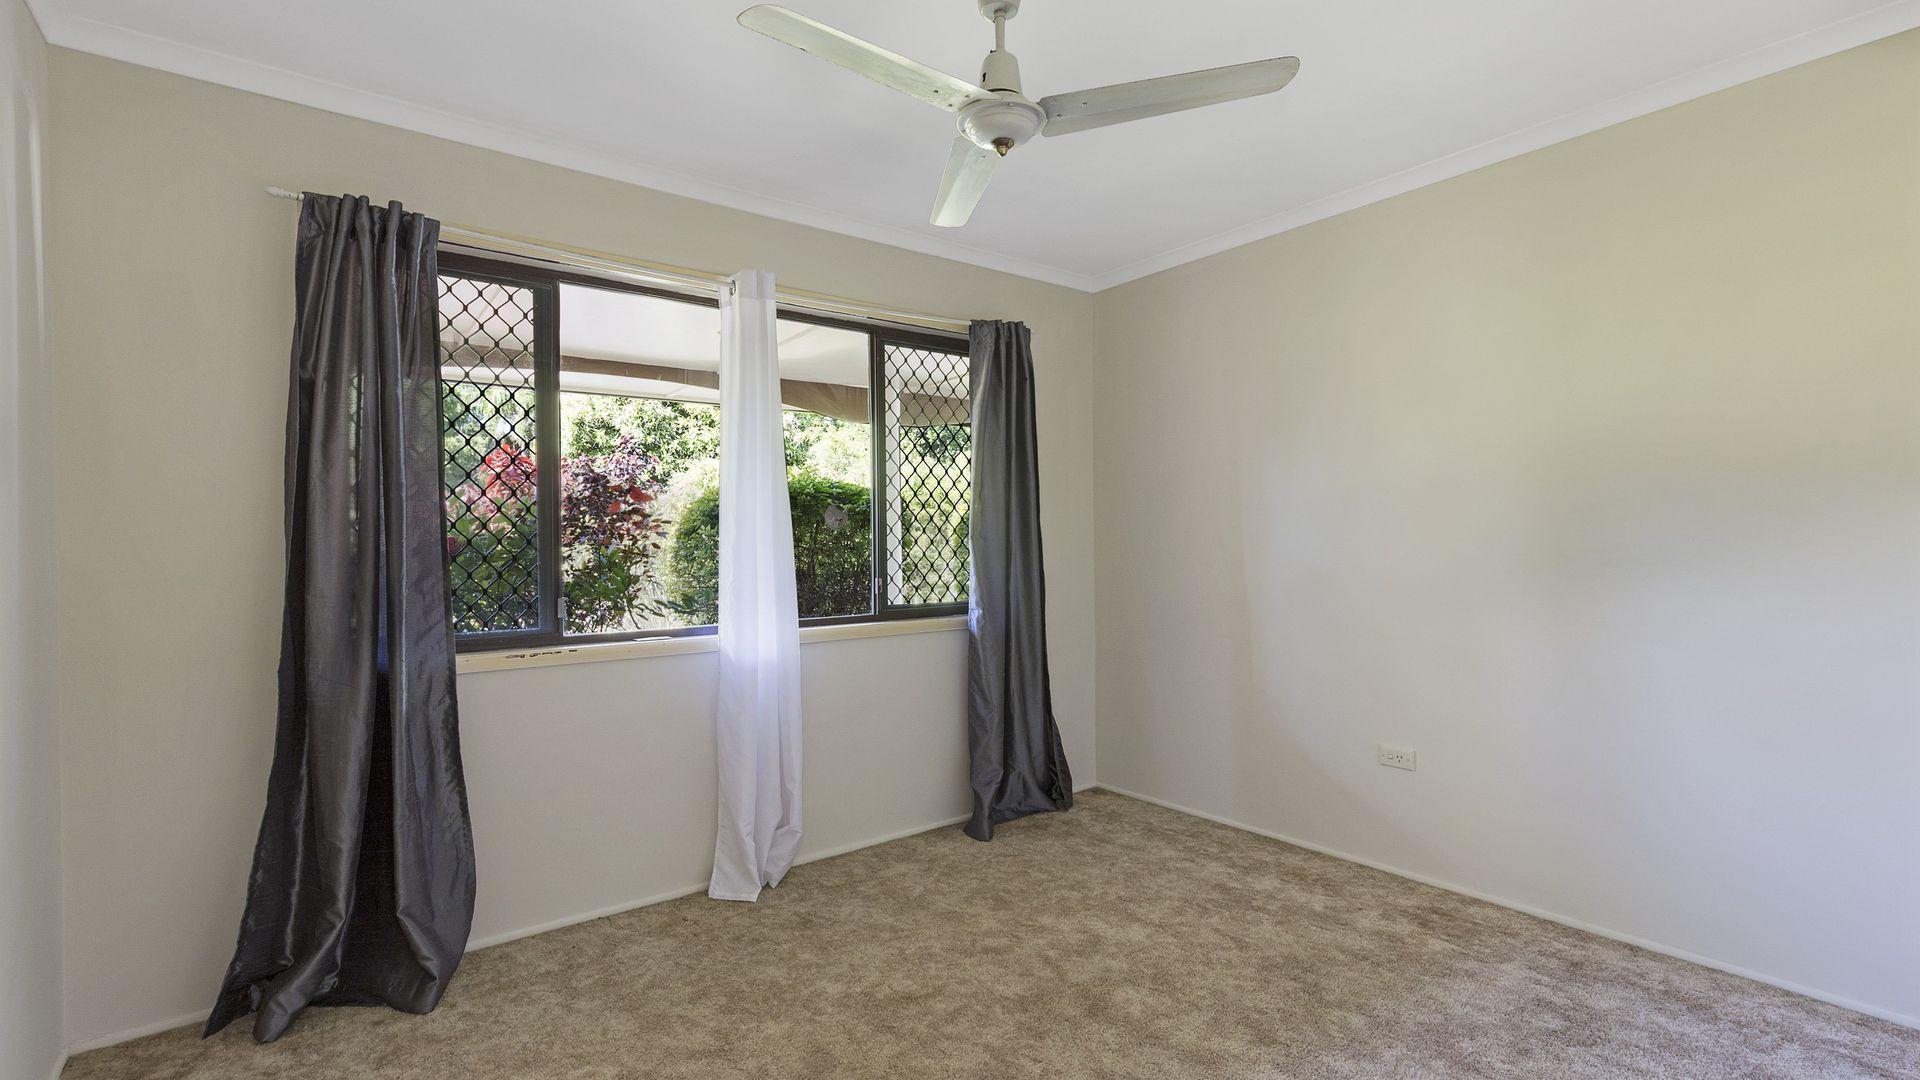 12 Valantine Road, Birkdale QLD 4159, Image 2